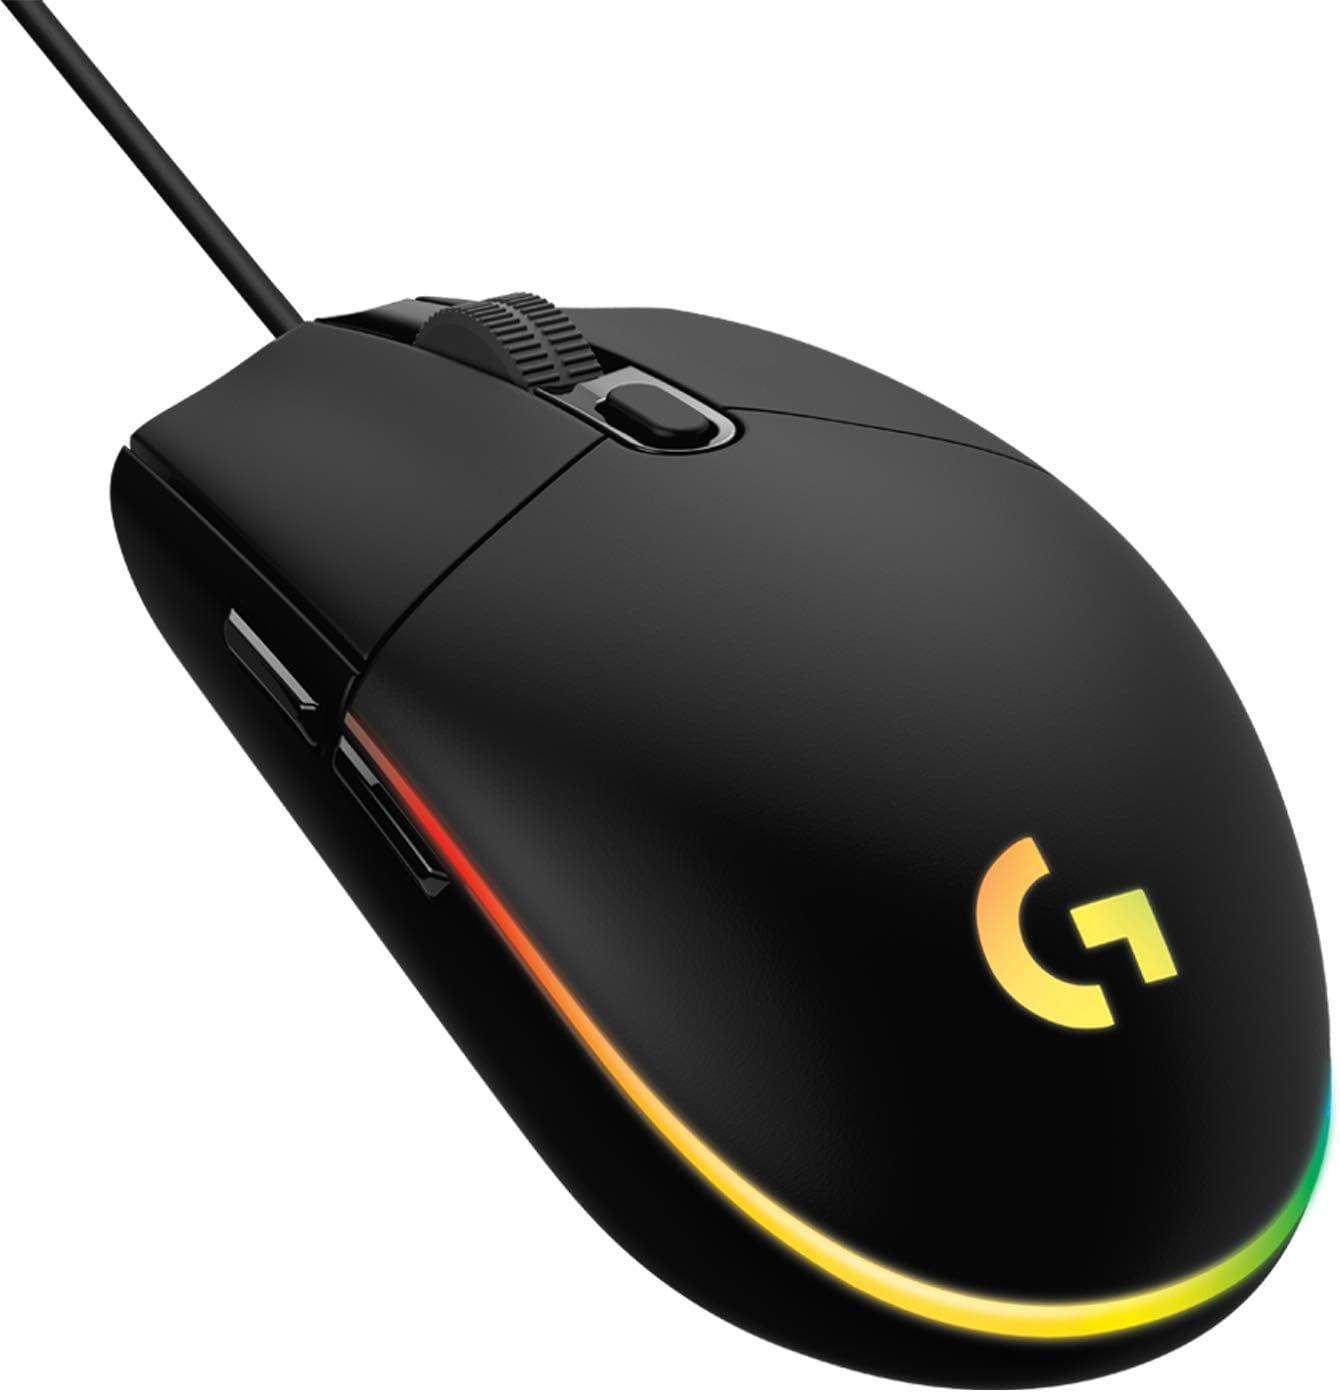 Logitech G203 LIGHTSYNC Ratón con iluminación RGB personalizable para gaming, 6 botones programables, sensor para gaming, seguimiento de hasta 8.000 dpi, peso ligero,G203 2ª Gen.,Negro